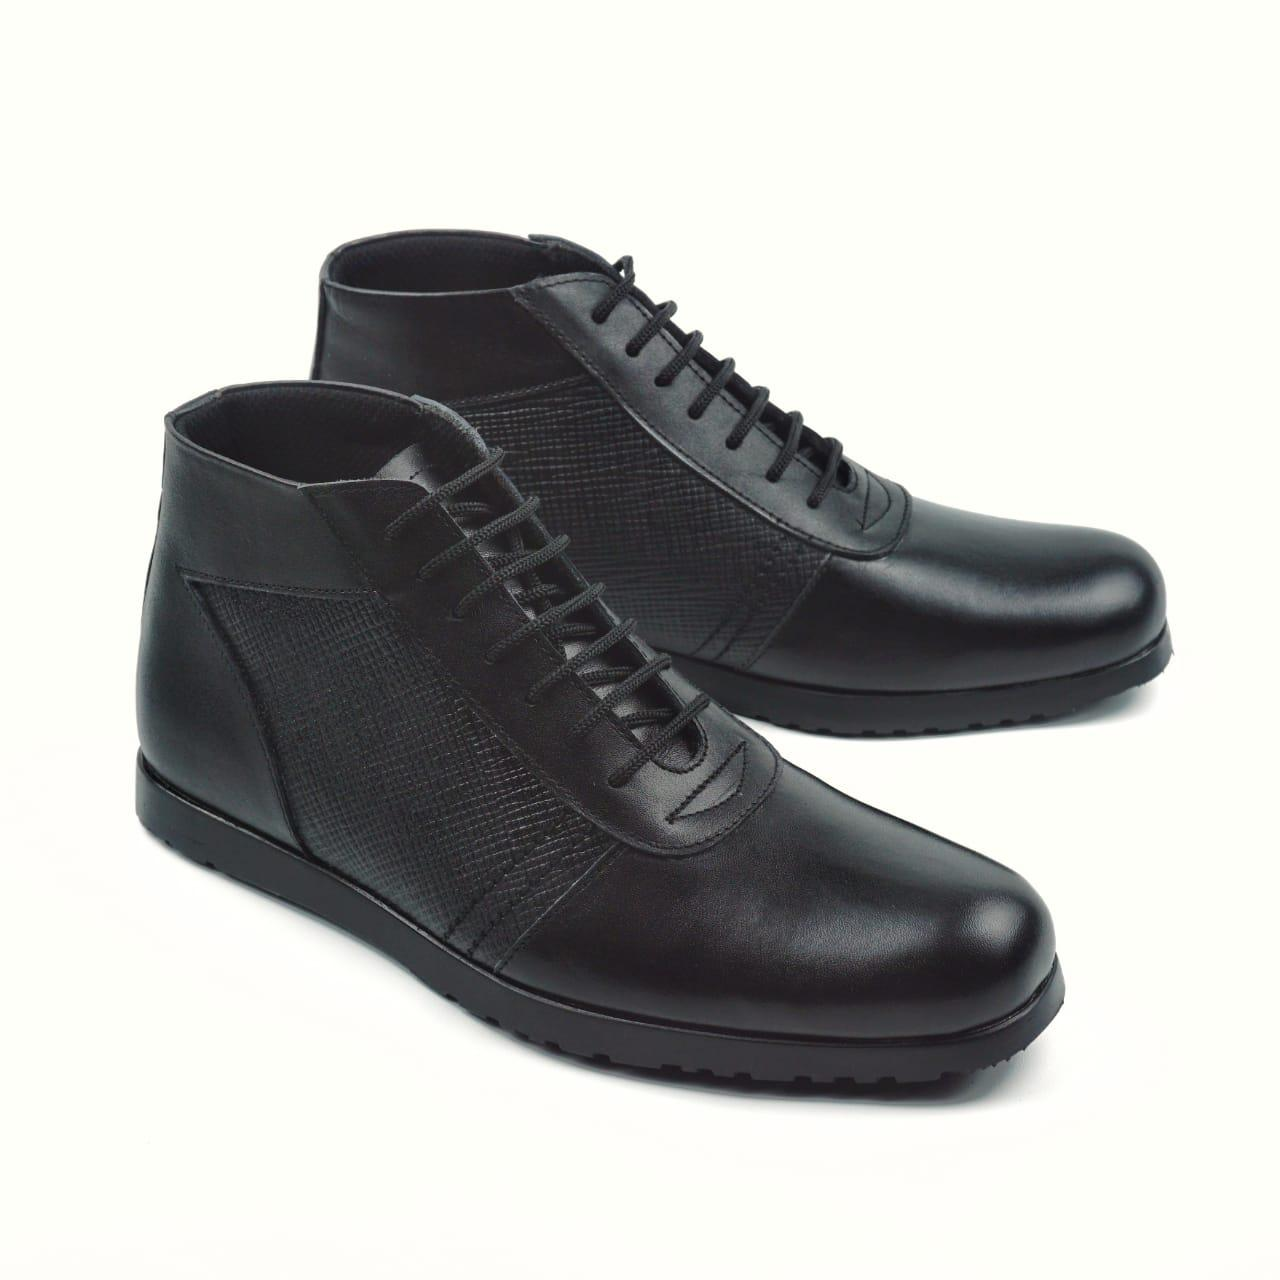 Sepatu Boot Pria Dress Boots Like Fordza 0333 Model Semi Pantofel Warna hitam Kulit Asli